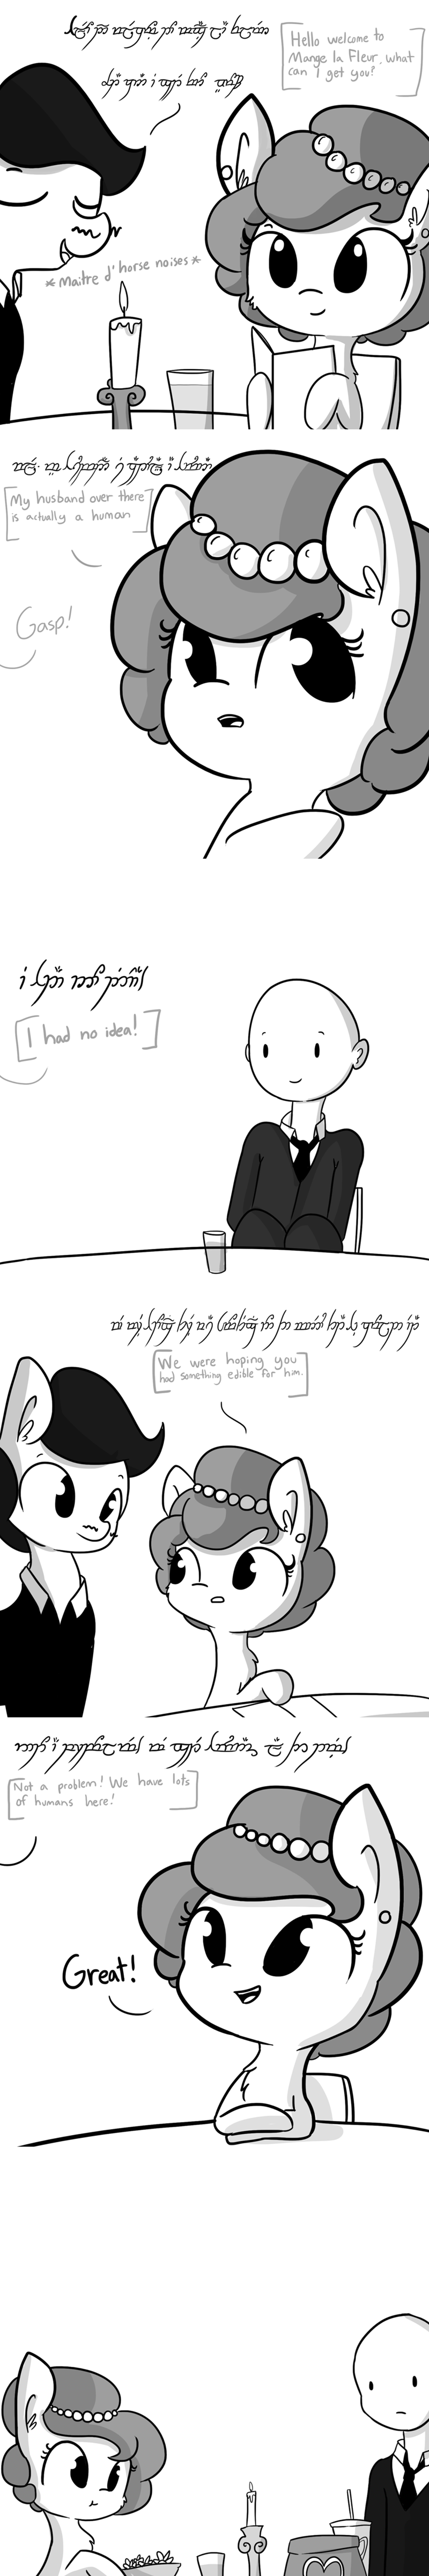 OC McDonald's comic horse wife - 9011453952